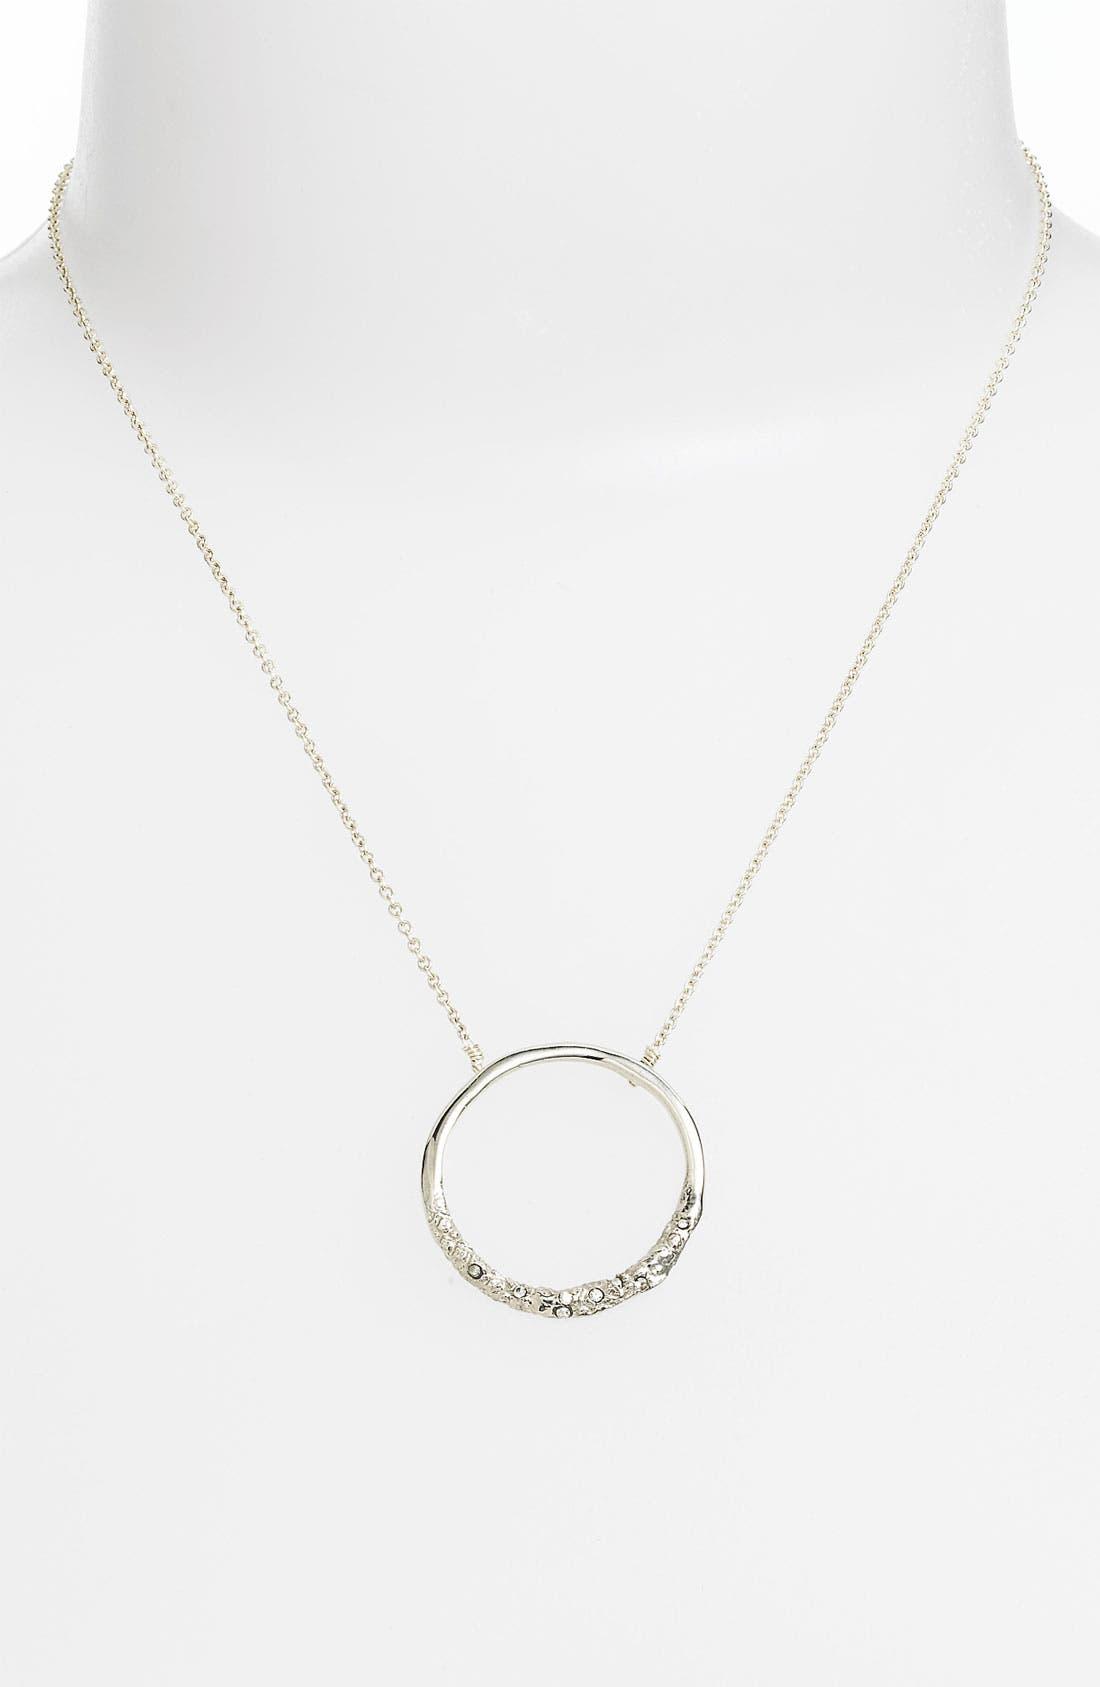 Alternate Image 1 Selected - Alexis Bittar 'Miss Havisham - New Wave' Pendant Necklace